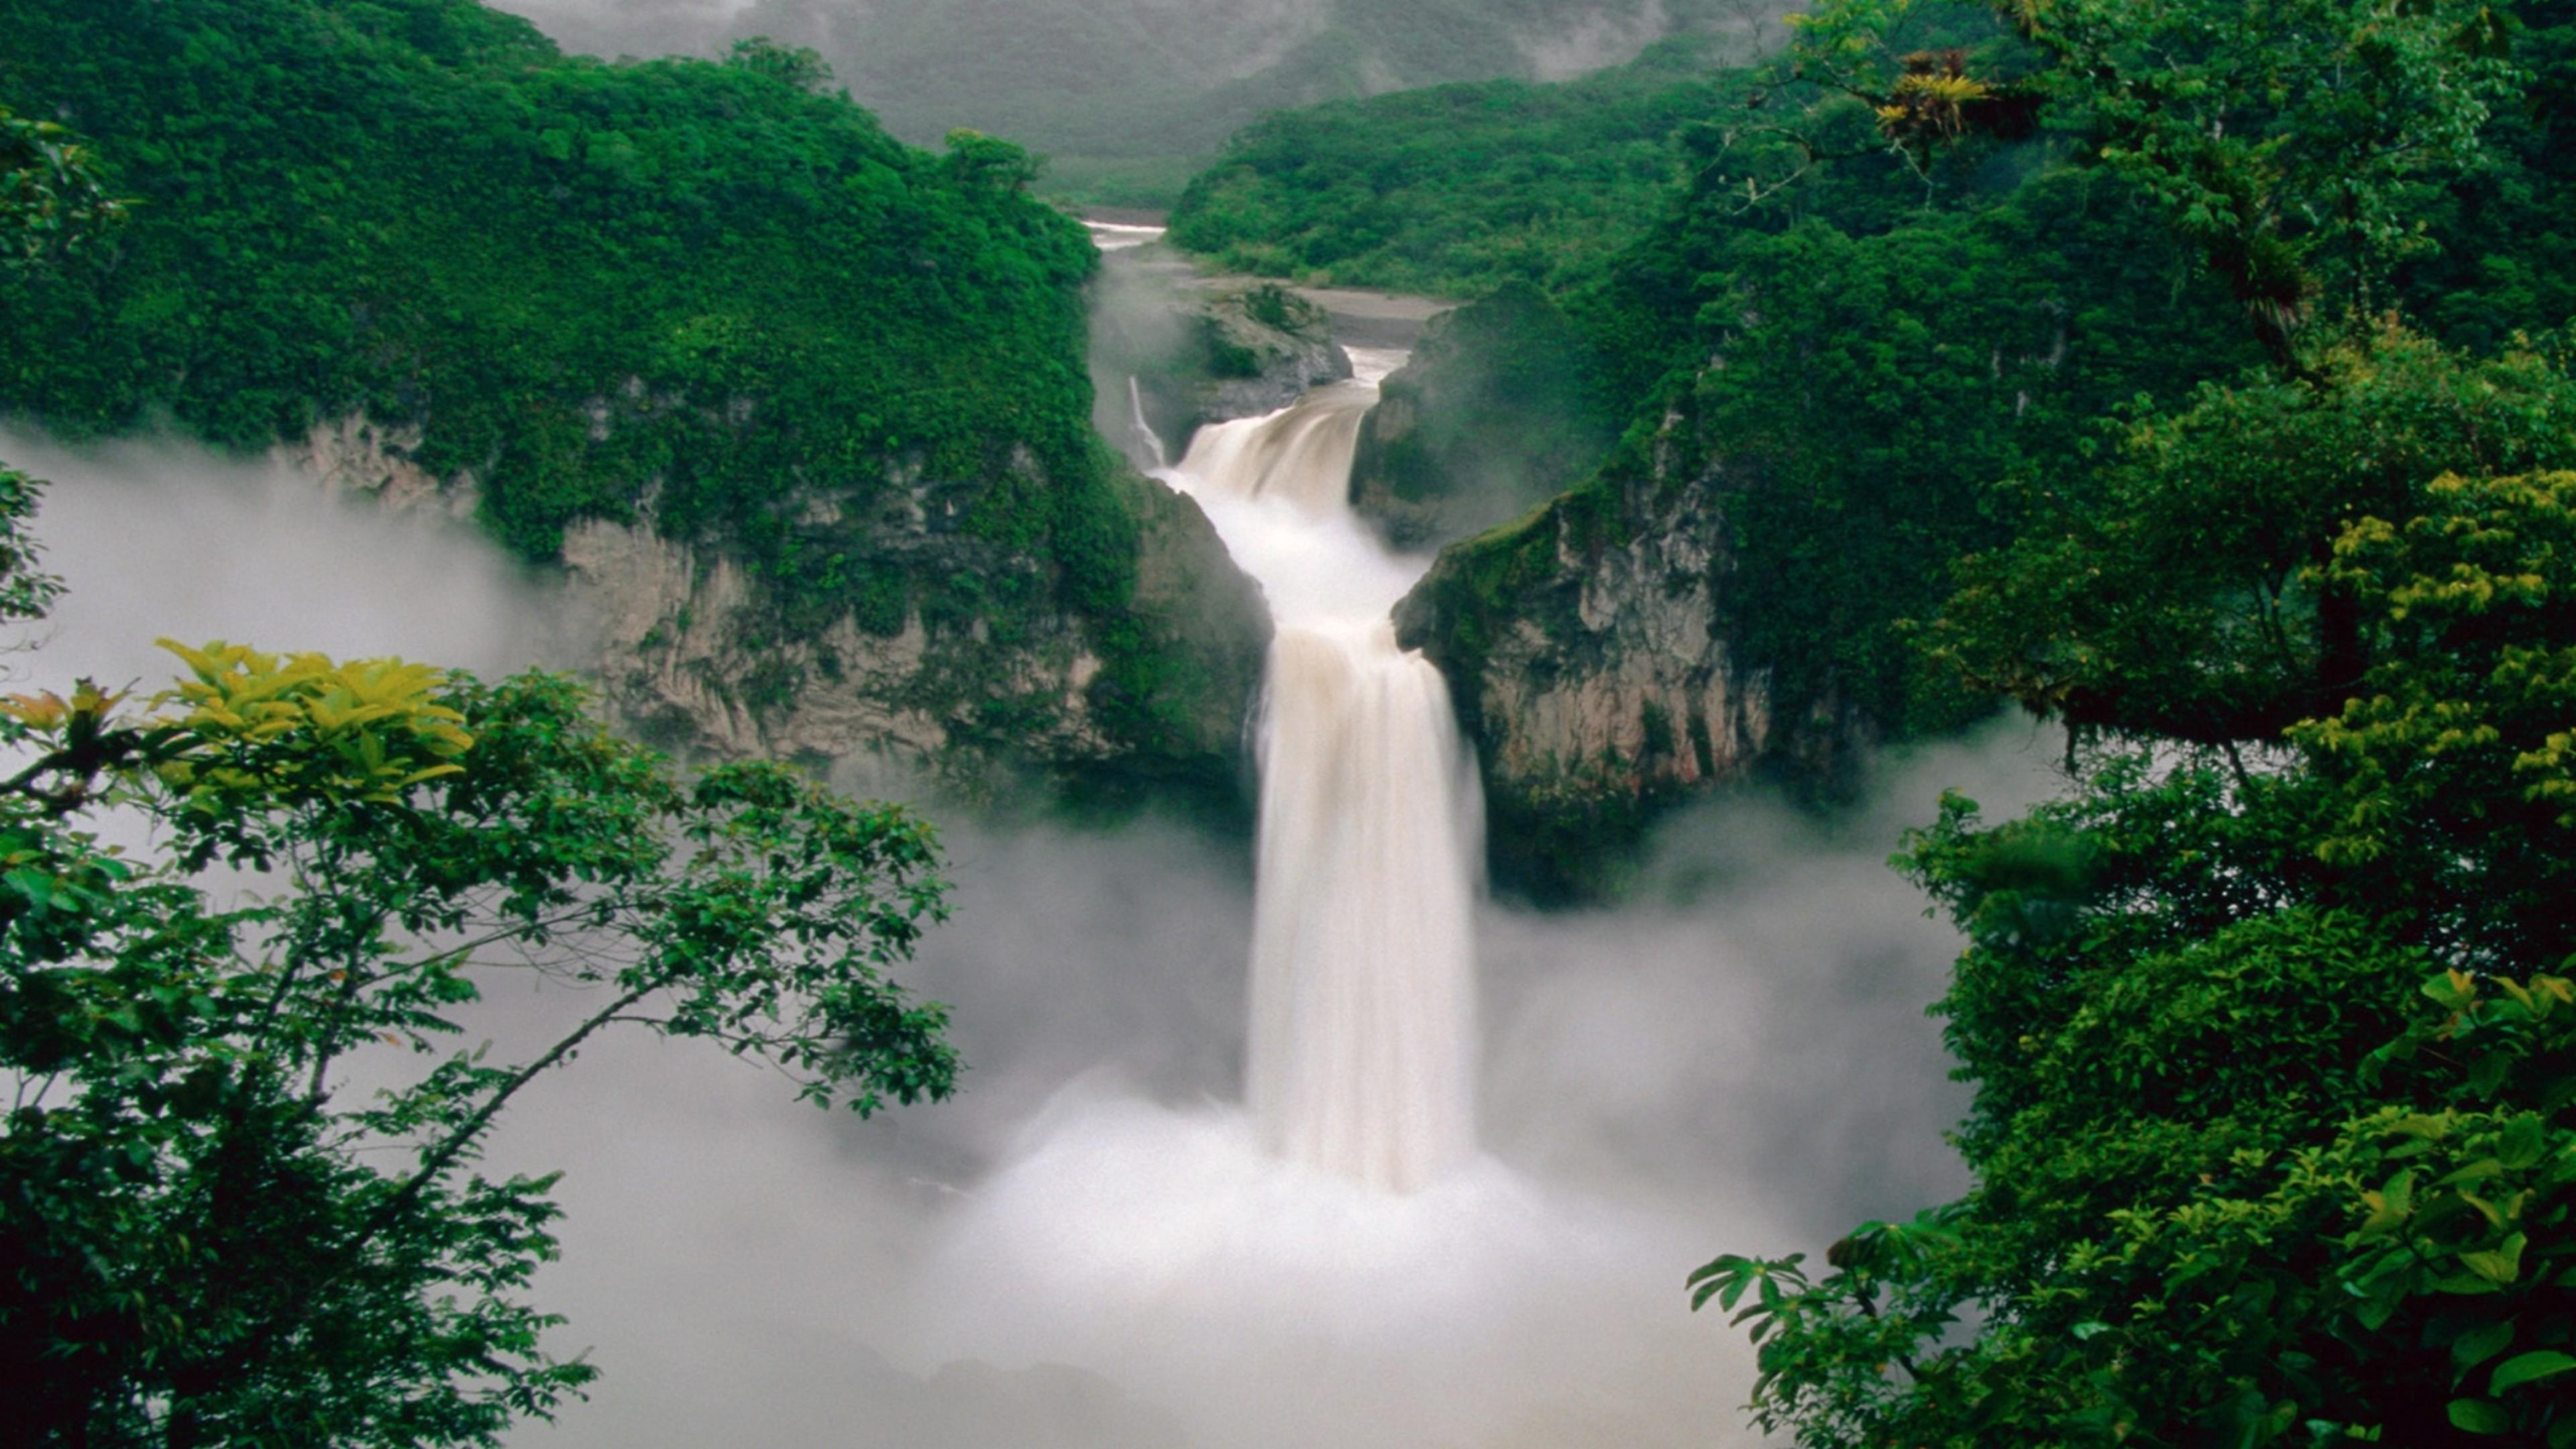 green forest waterfall 4k 1540131559 - Green Forest Waterfall 4k - waterfall wallpapers, nature wallpapers, green wallpapers, forest wallpapers